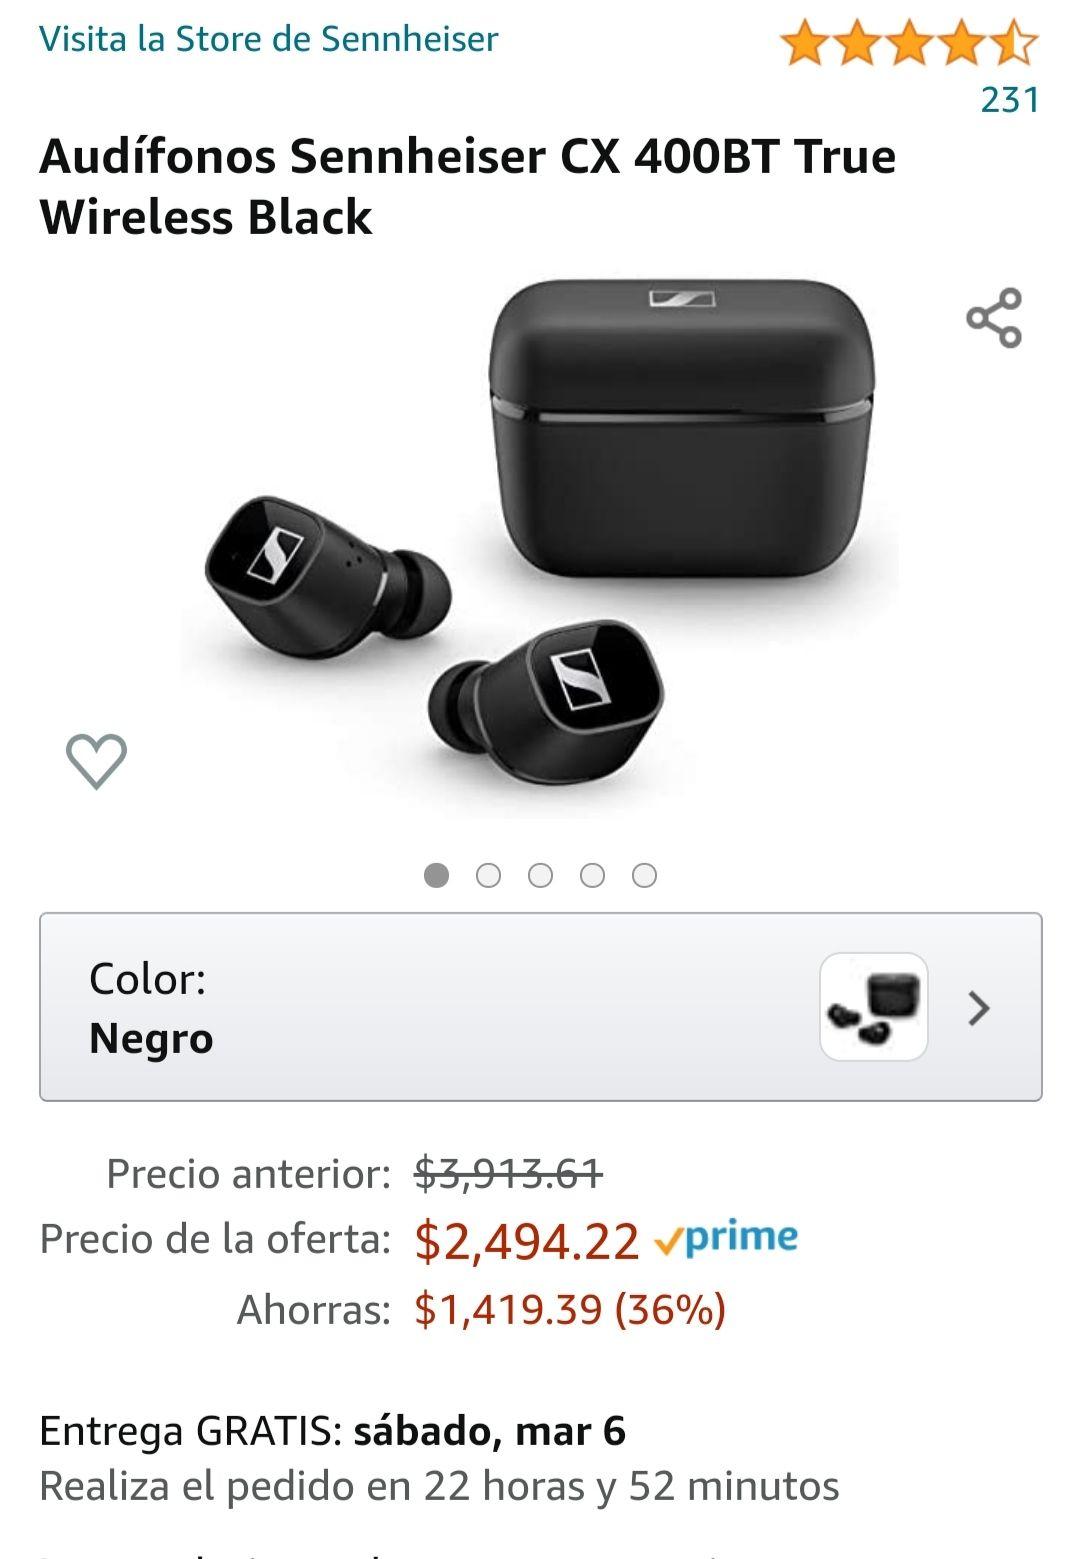 Amazon: Audifonos Sennheiser CX 400BT